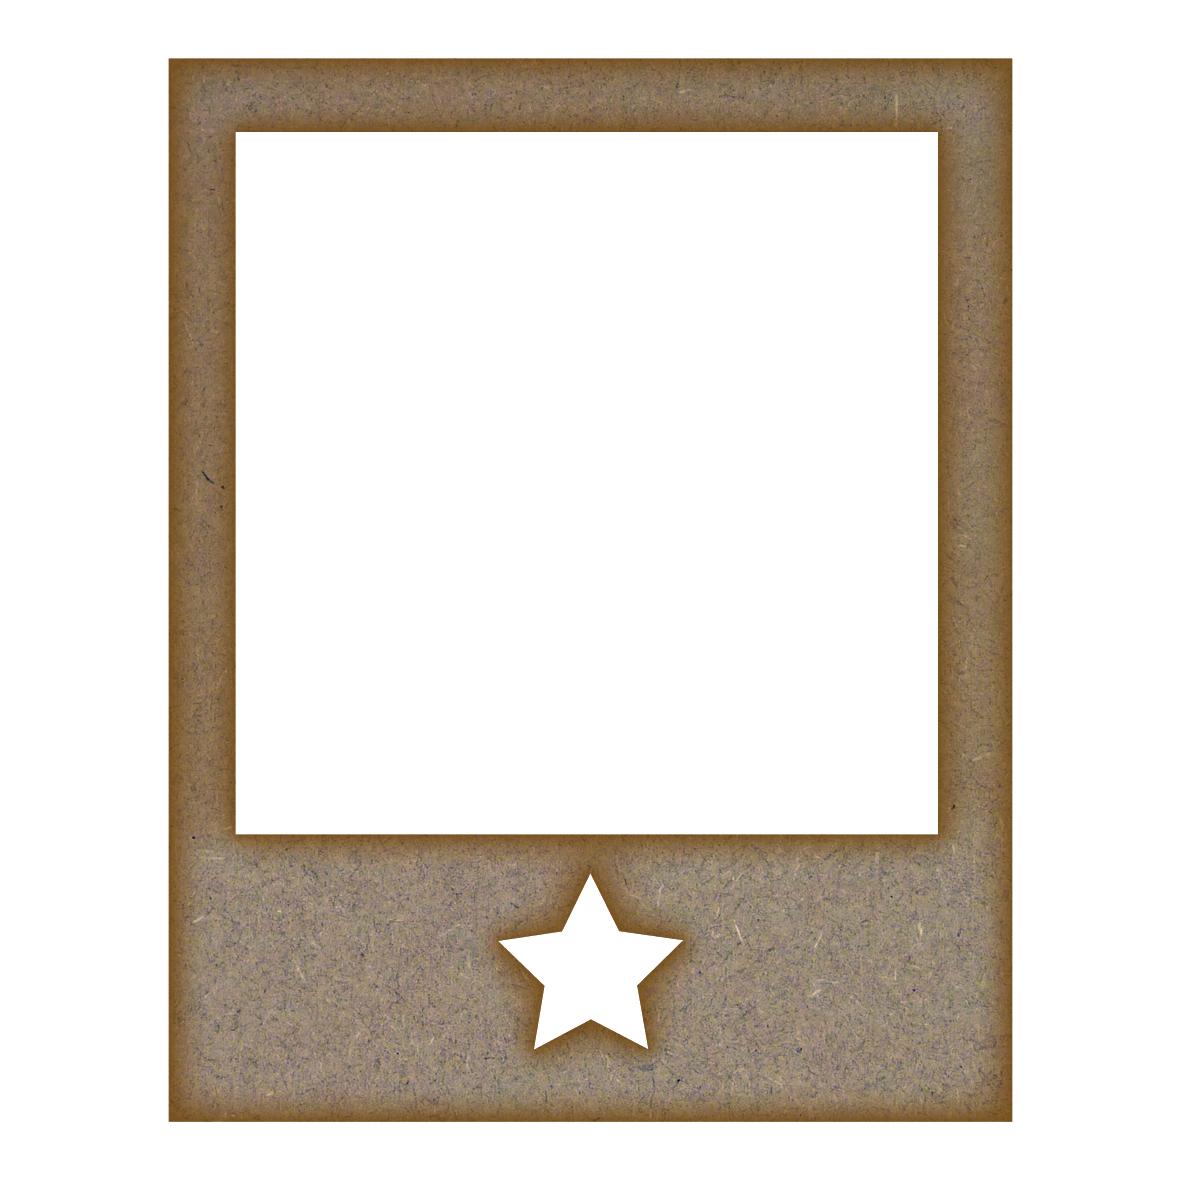 retro photo frame star mdf laser cut craft blanks in various